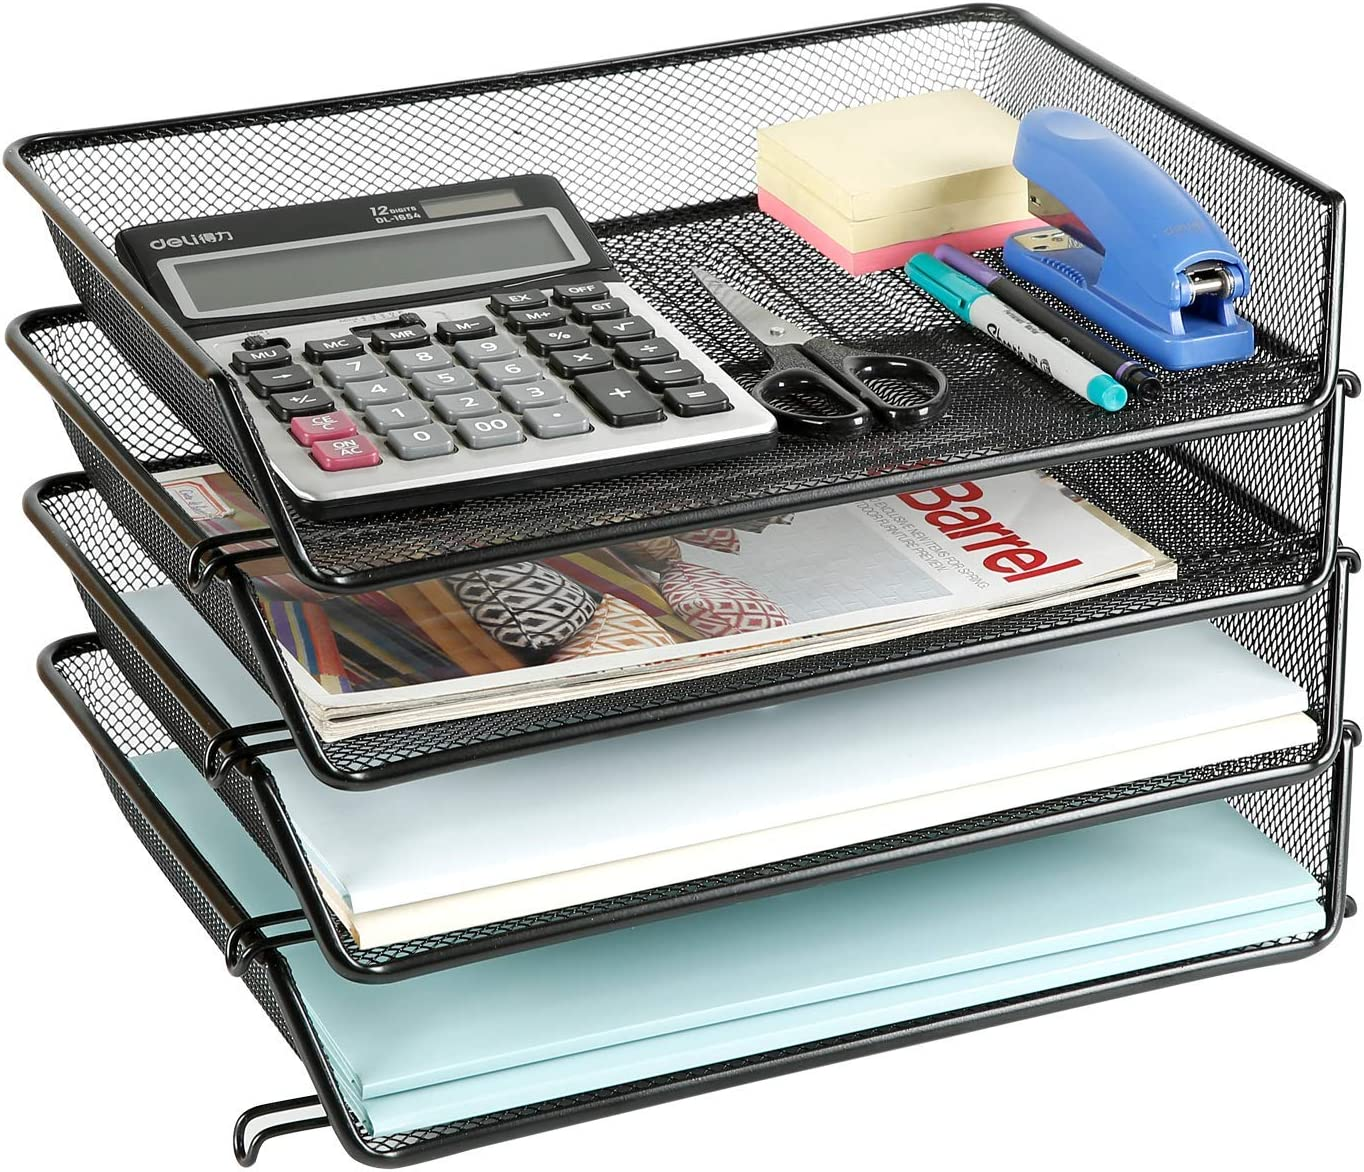 DESIGNA Stackable Metal Mesh Desk Trays 37 Tier File Document Letter Tray  Desk Organizer Desktop Paper Tray Rack for Home Office School Stacking